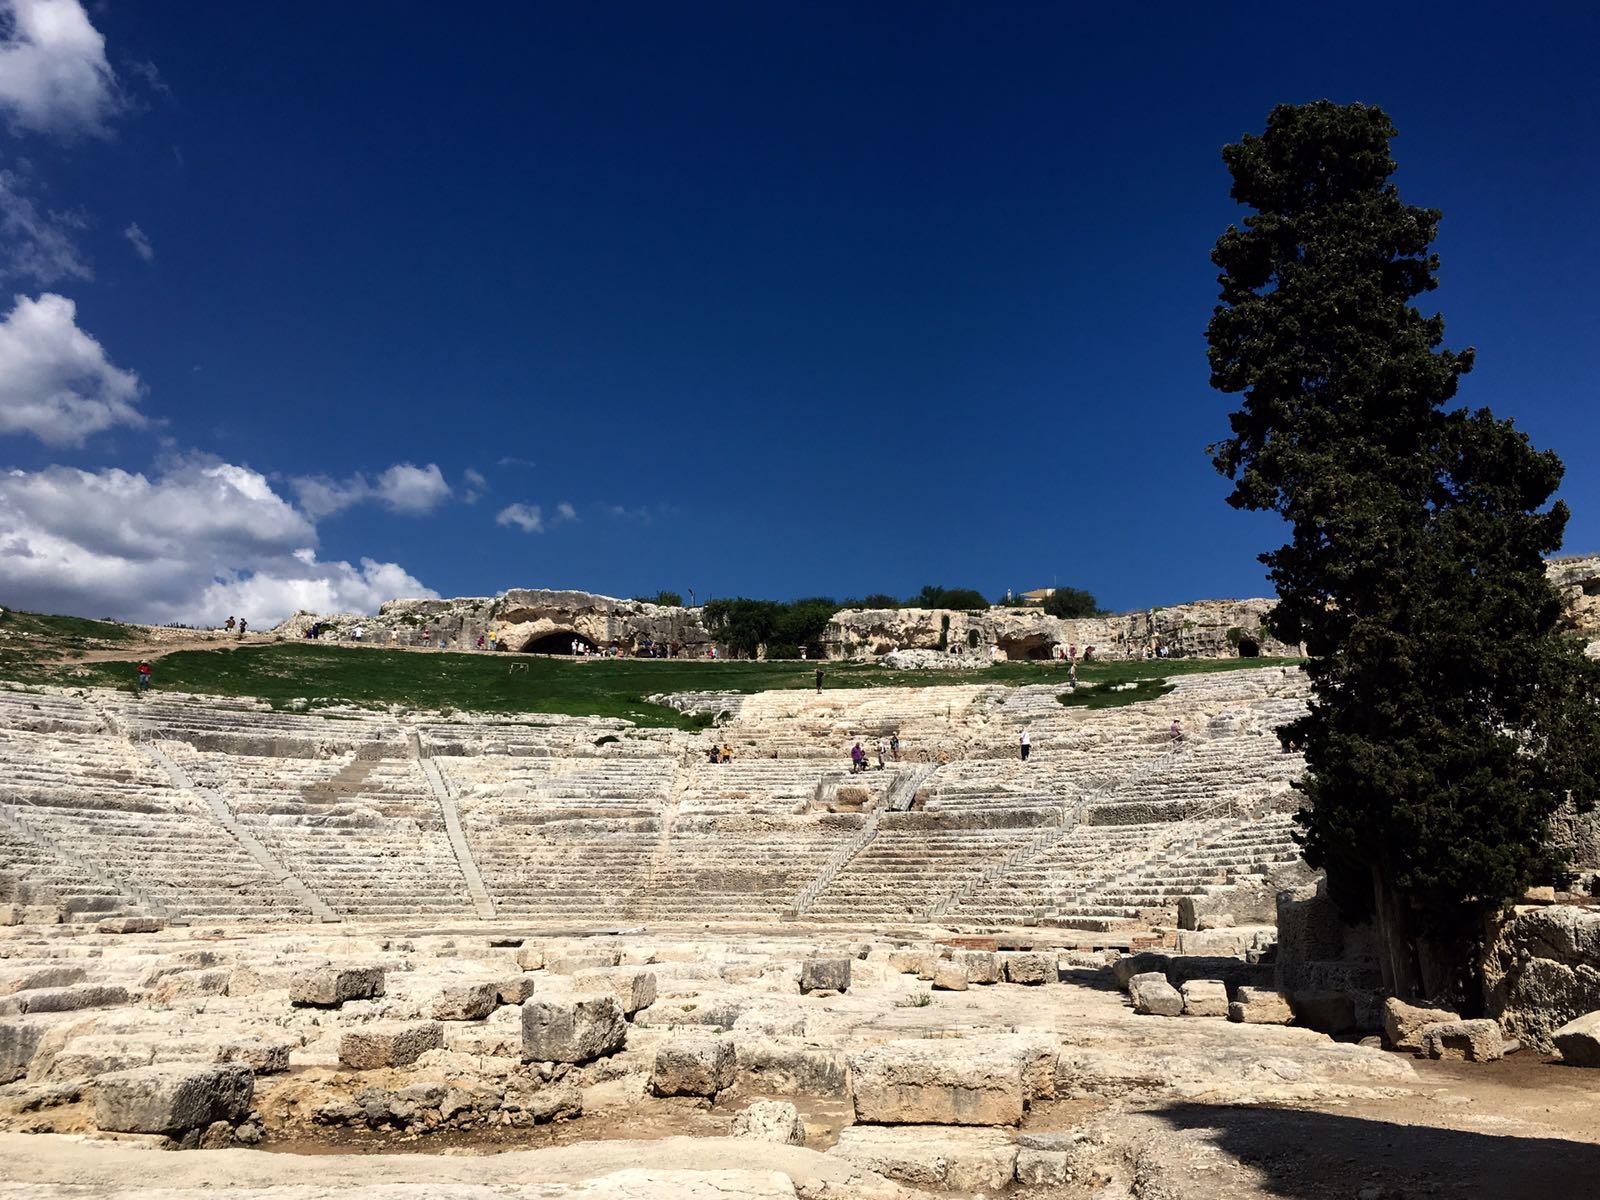 anticke mesto syrakuzy